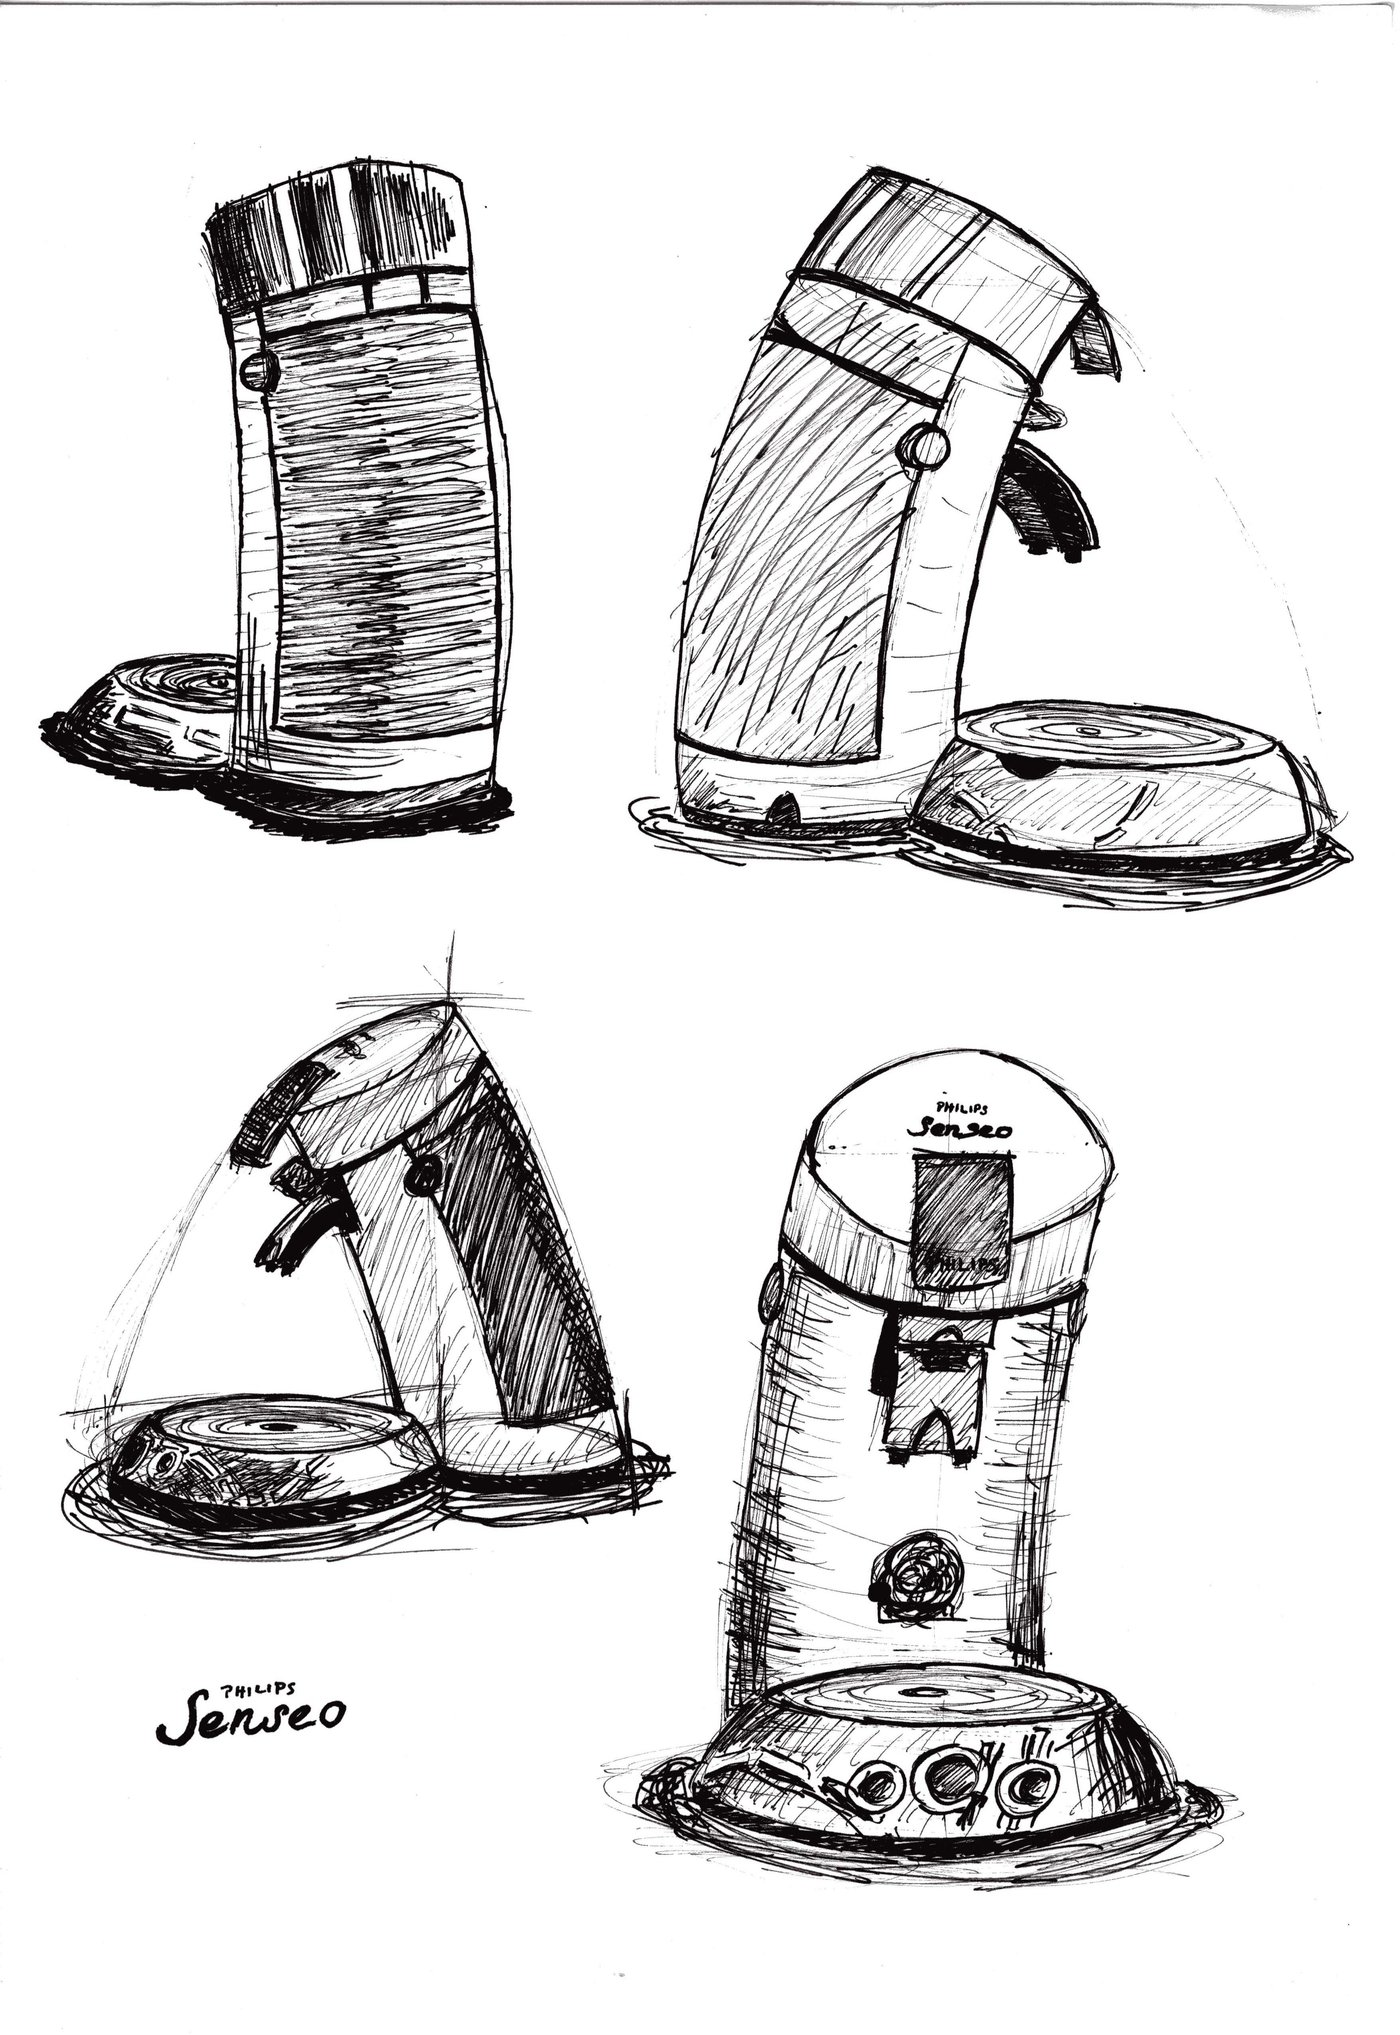 Design Sketches By Jan Bernd Rose At Coroflot